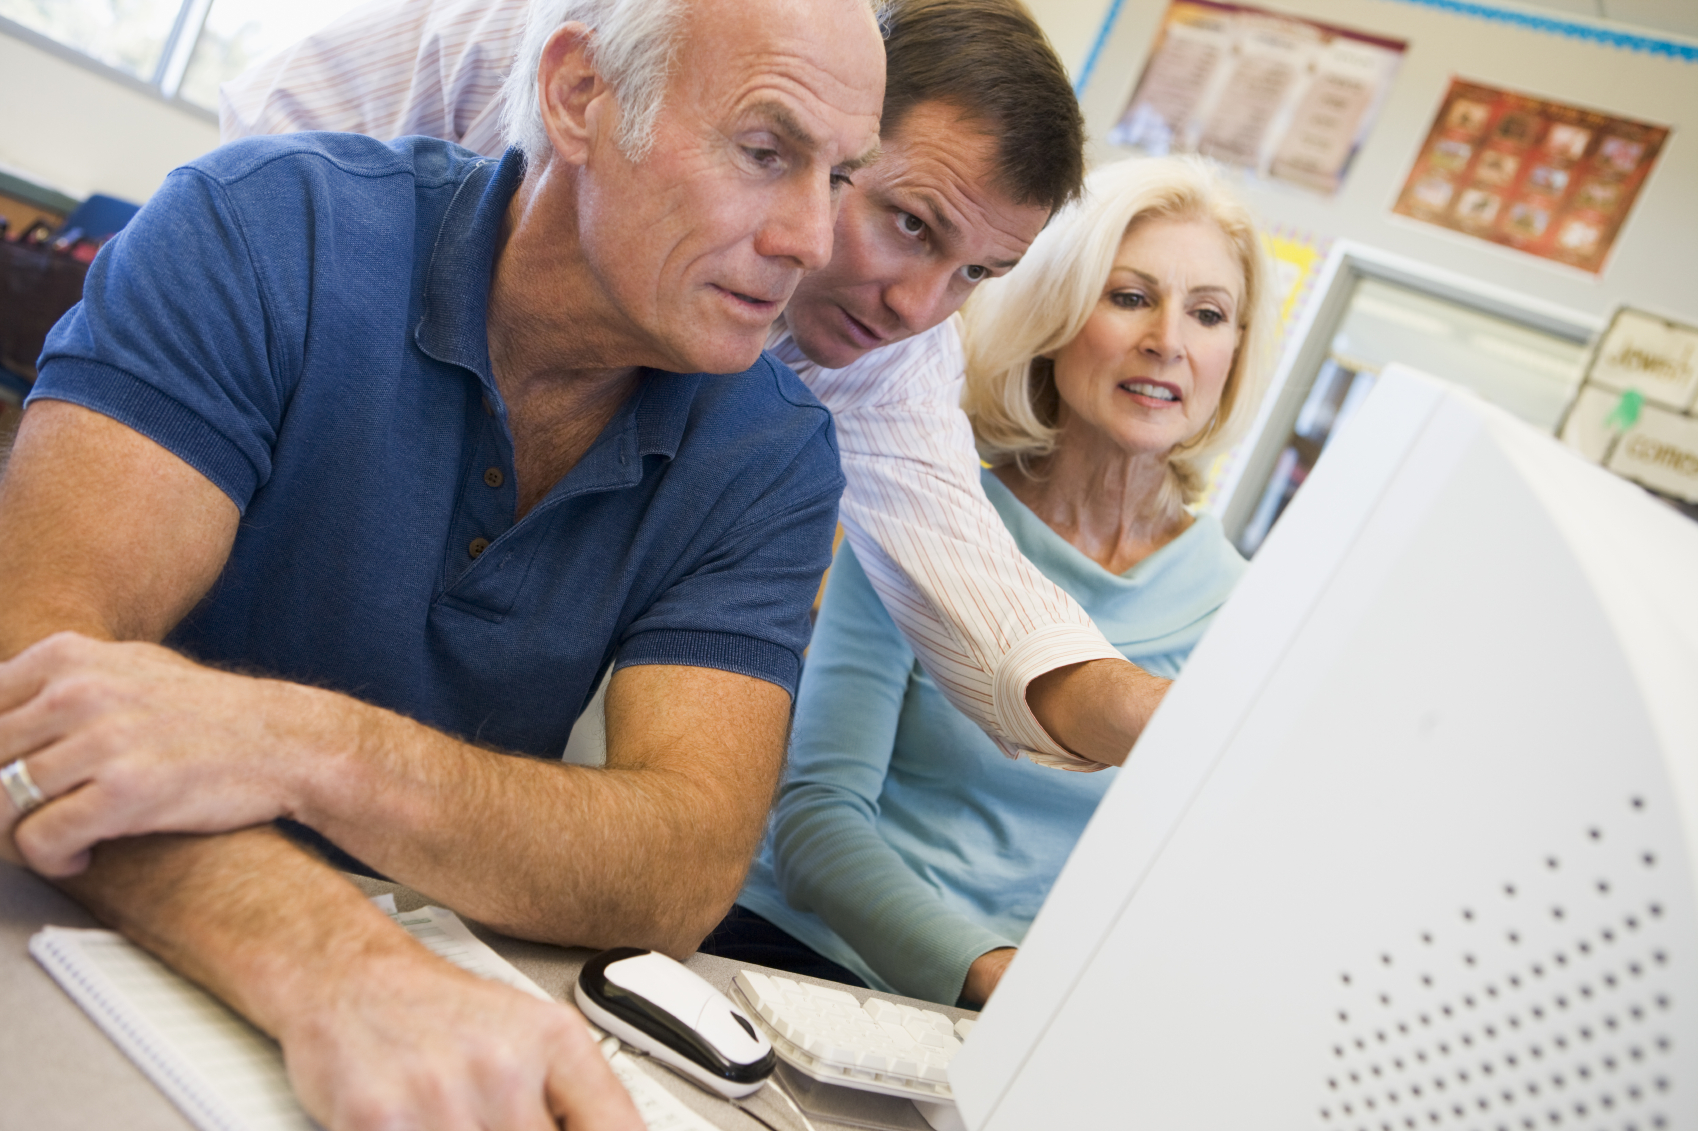 seniors learning computer skills older workers older worker